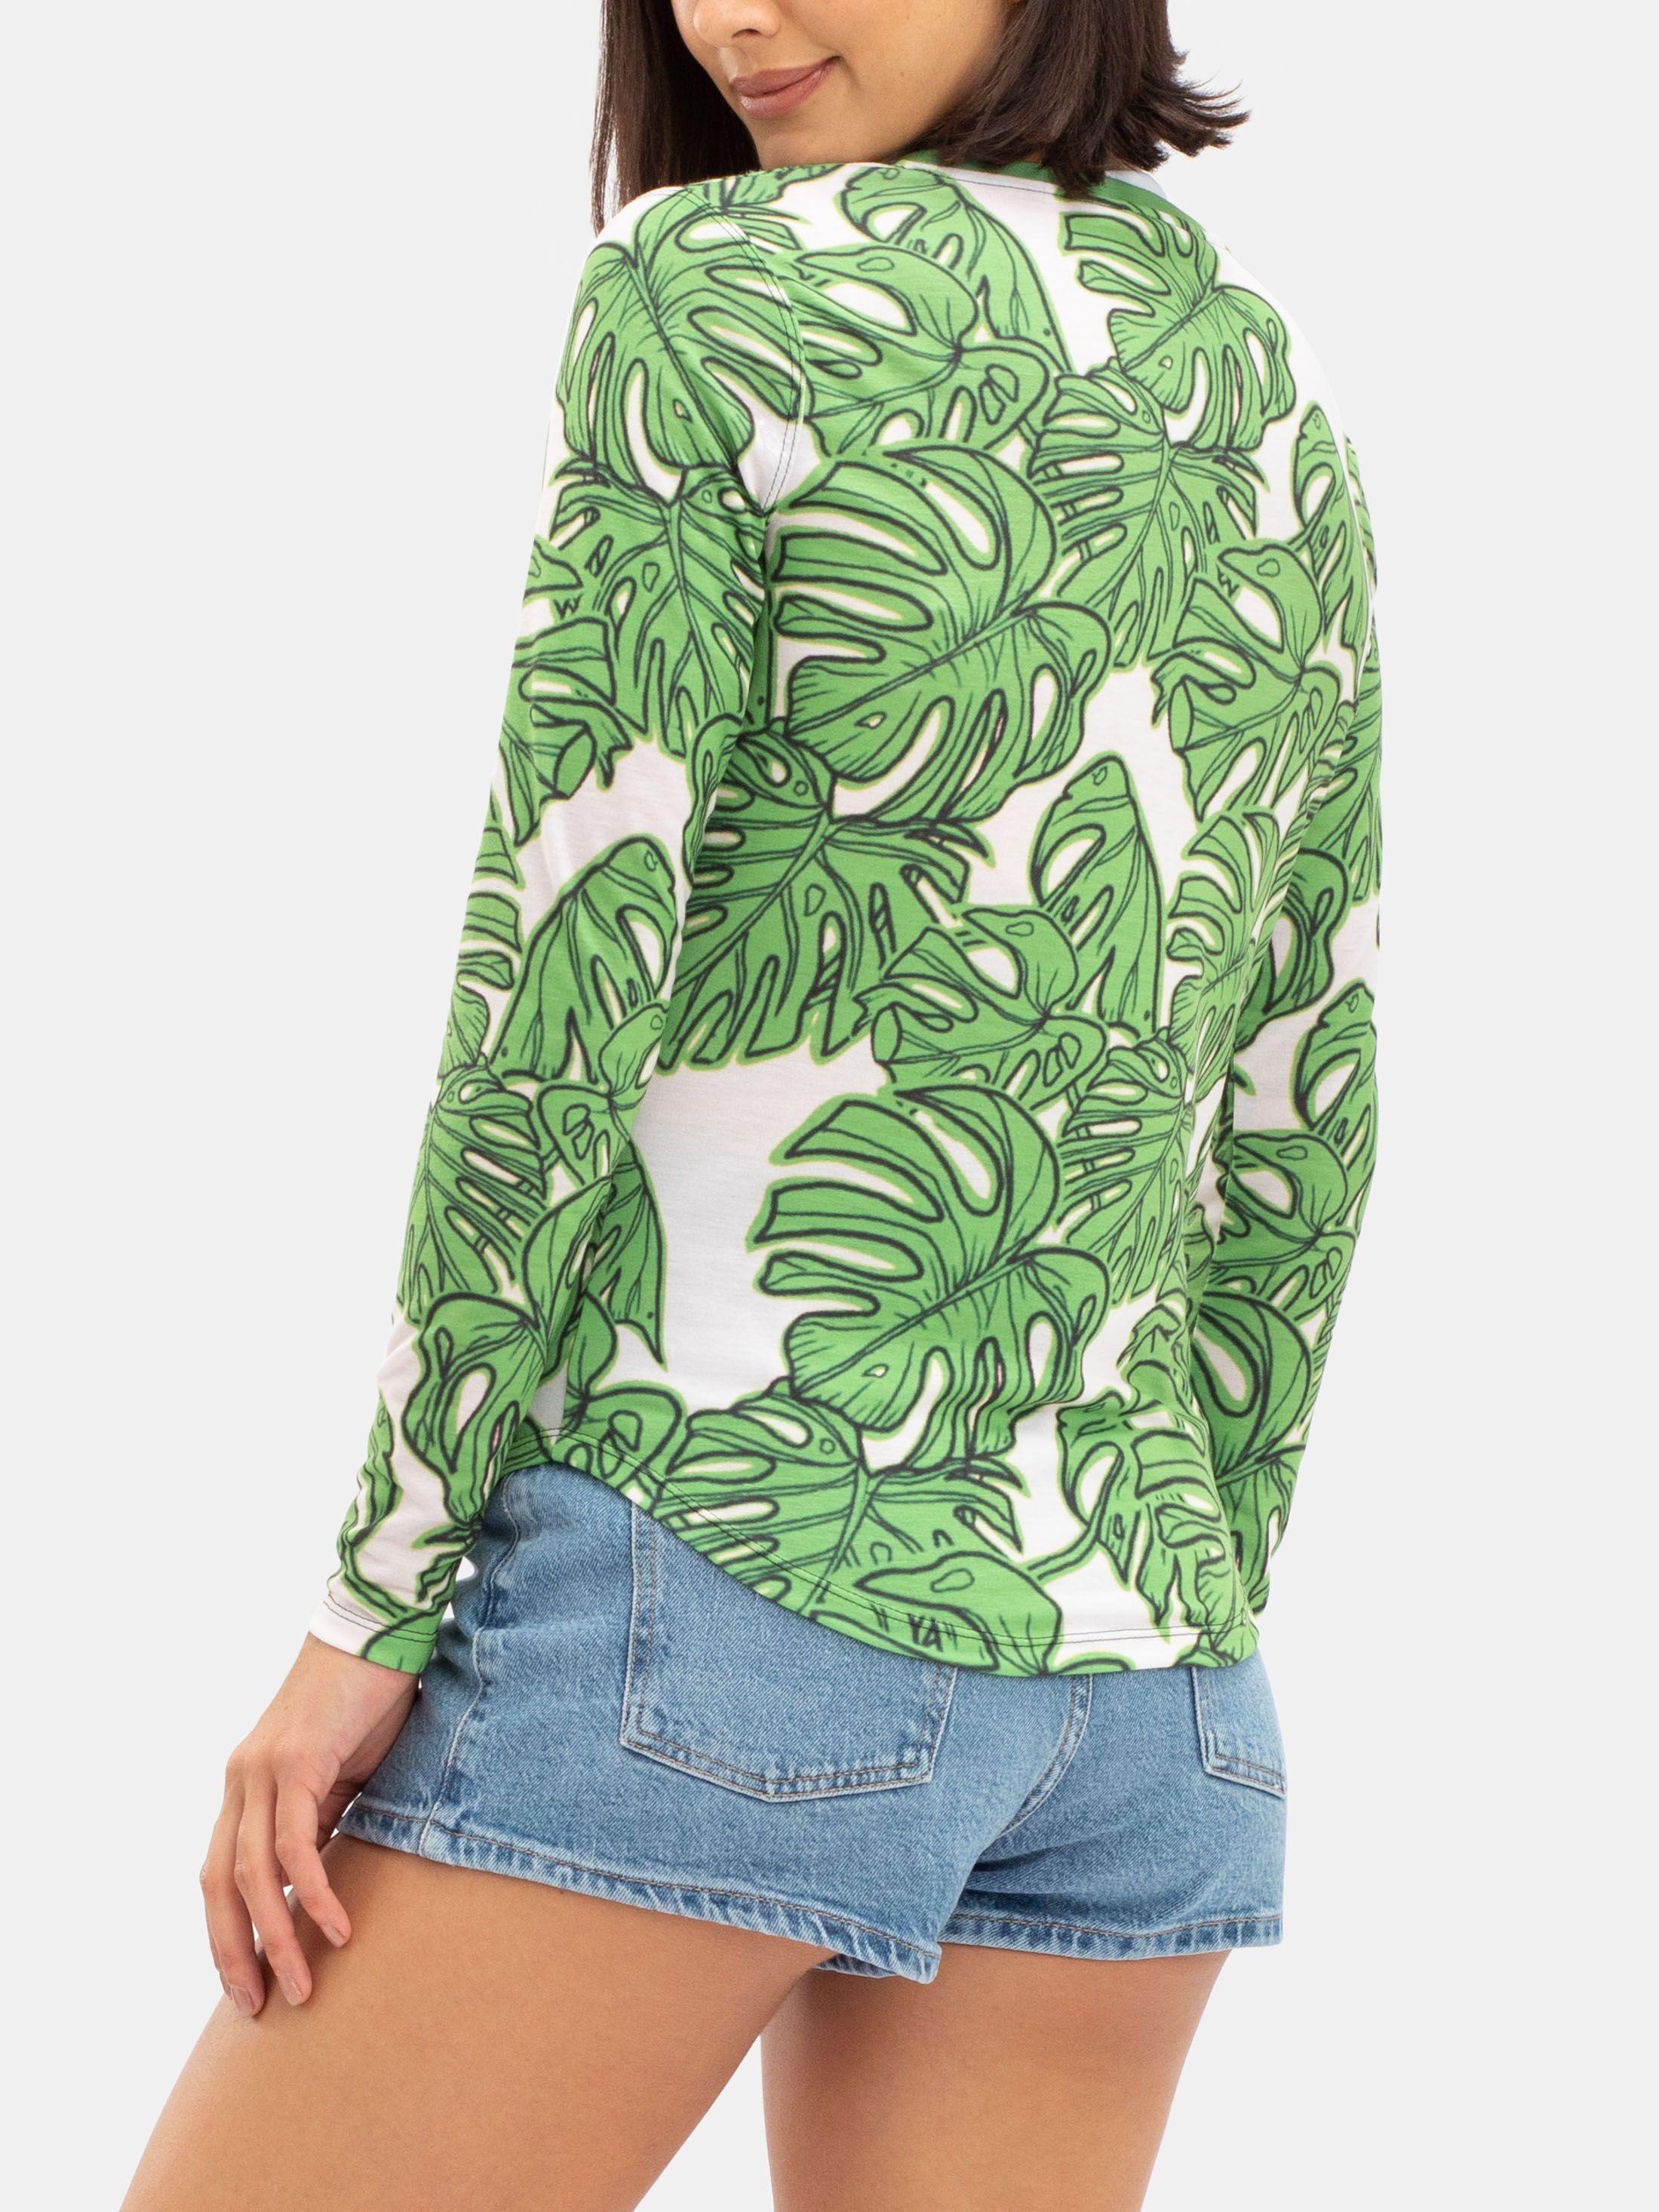 Women's Personalised Long Sleeve T-Shirt